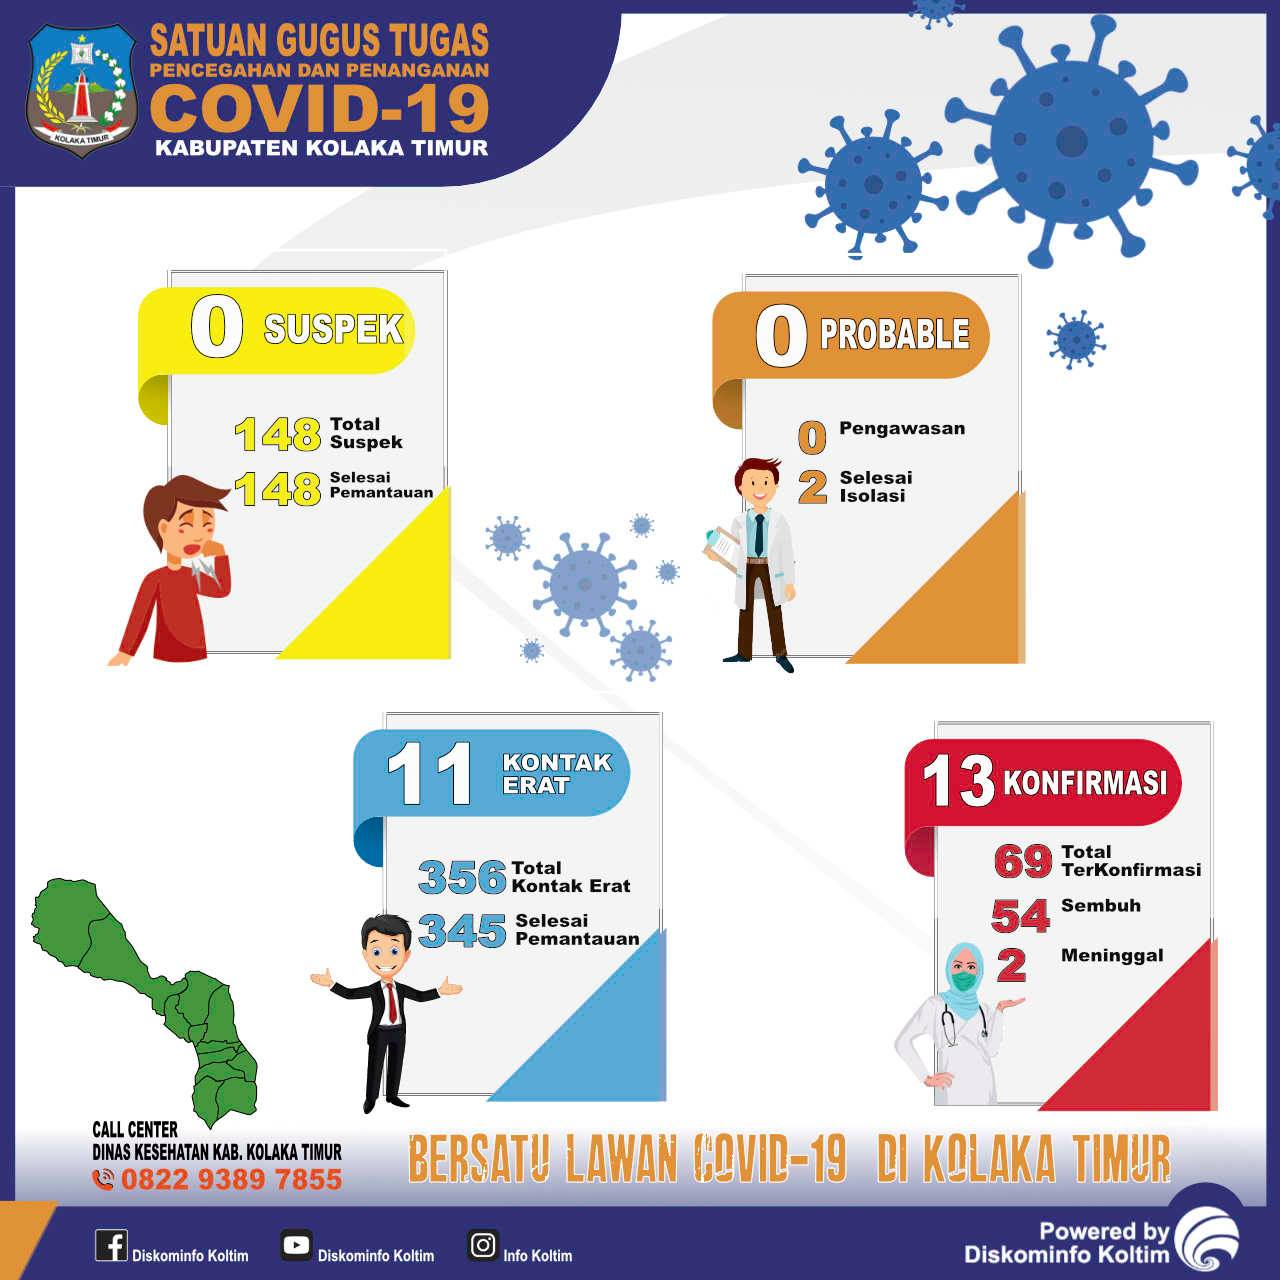 DATA COVID-19 KAB. KOLAKA TIMUR TANGGAL 14 DESEMBER 2020